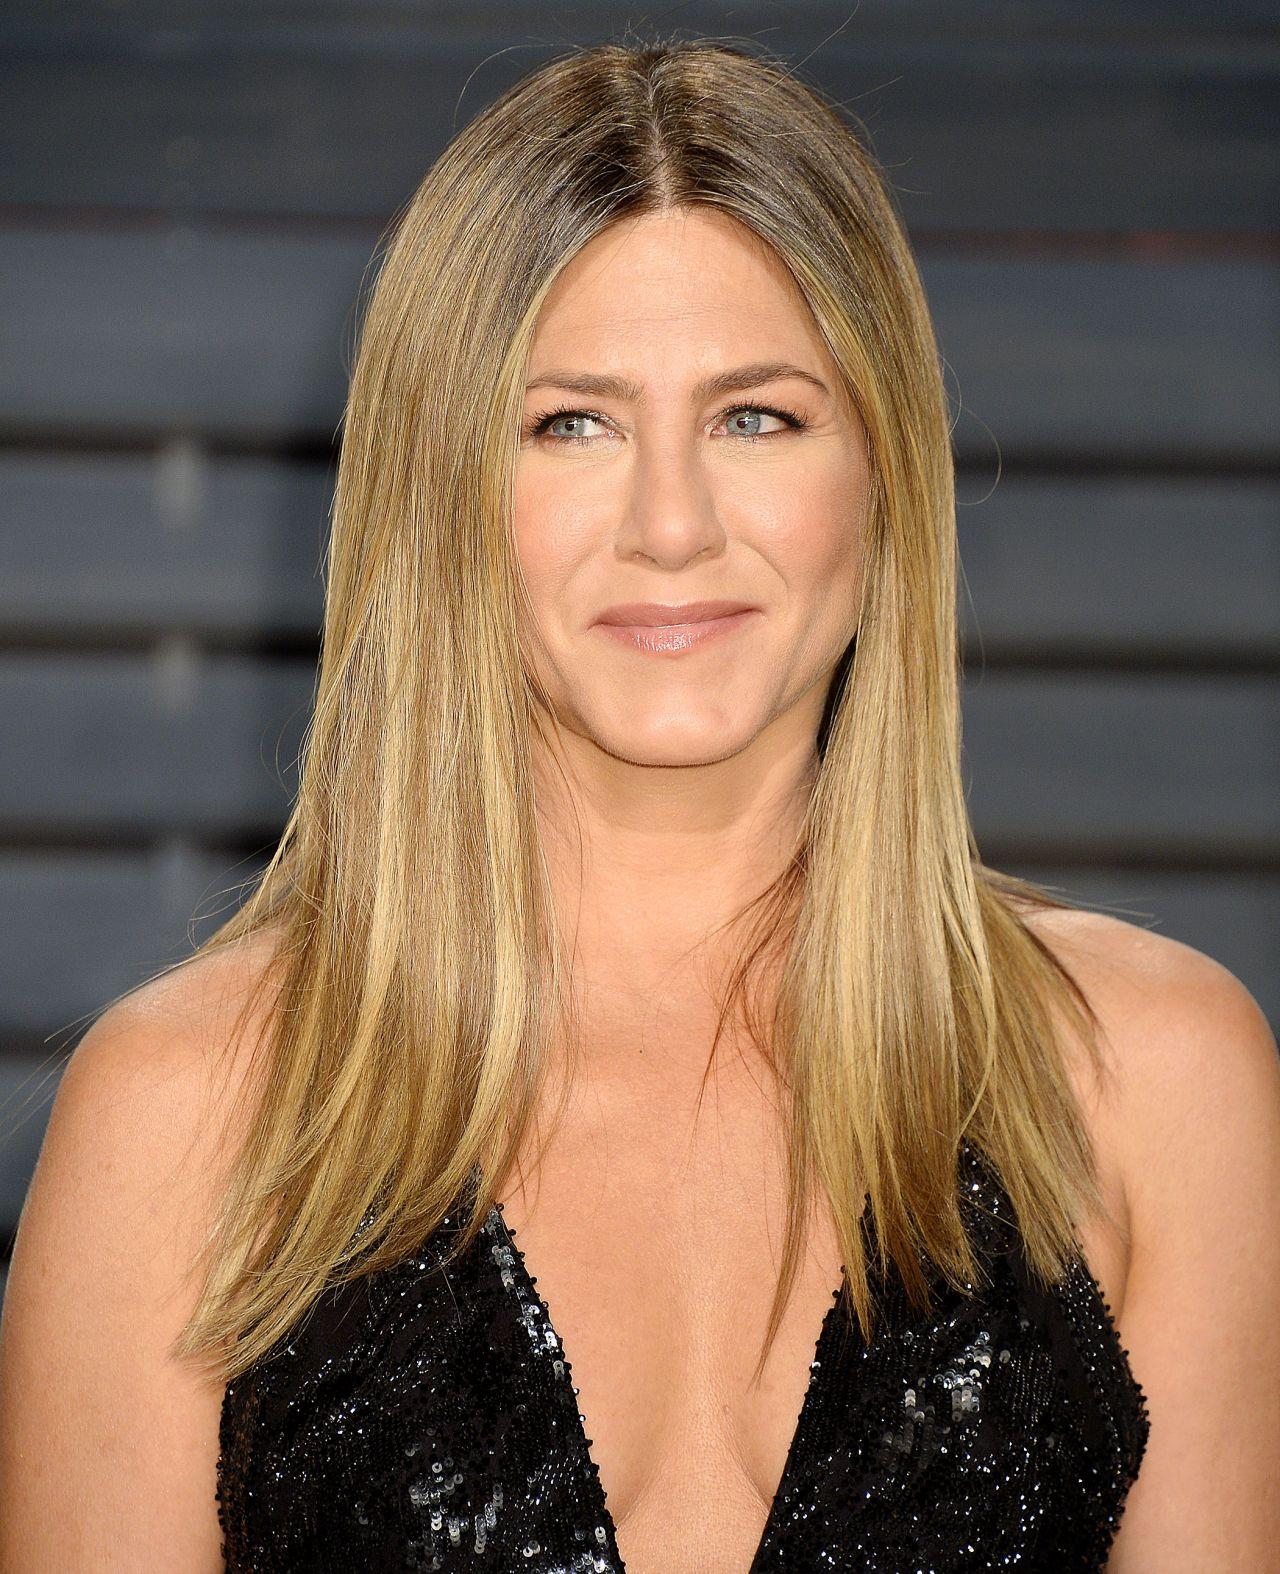 Jennifer Aniston at Vanity Fair Oscar 2017 Party in Los ...  Jennifer Anisto...